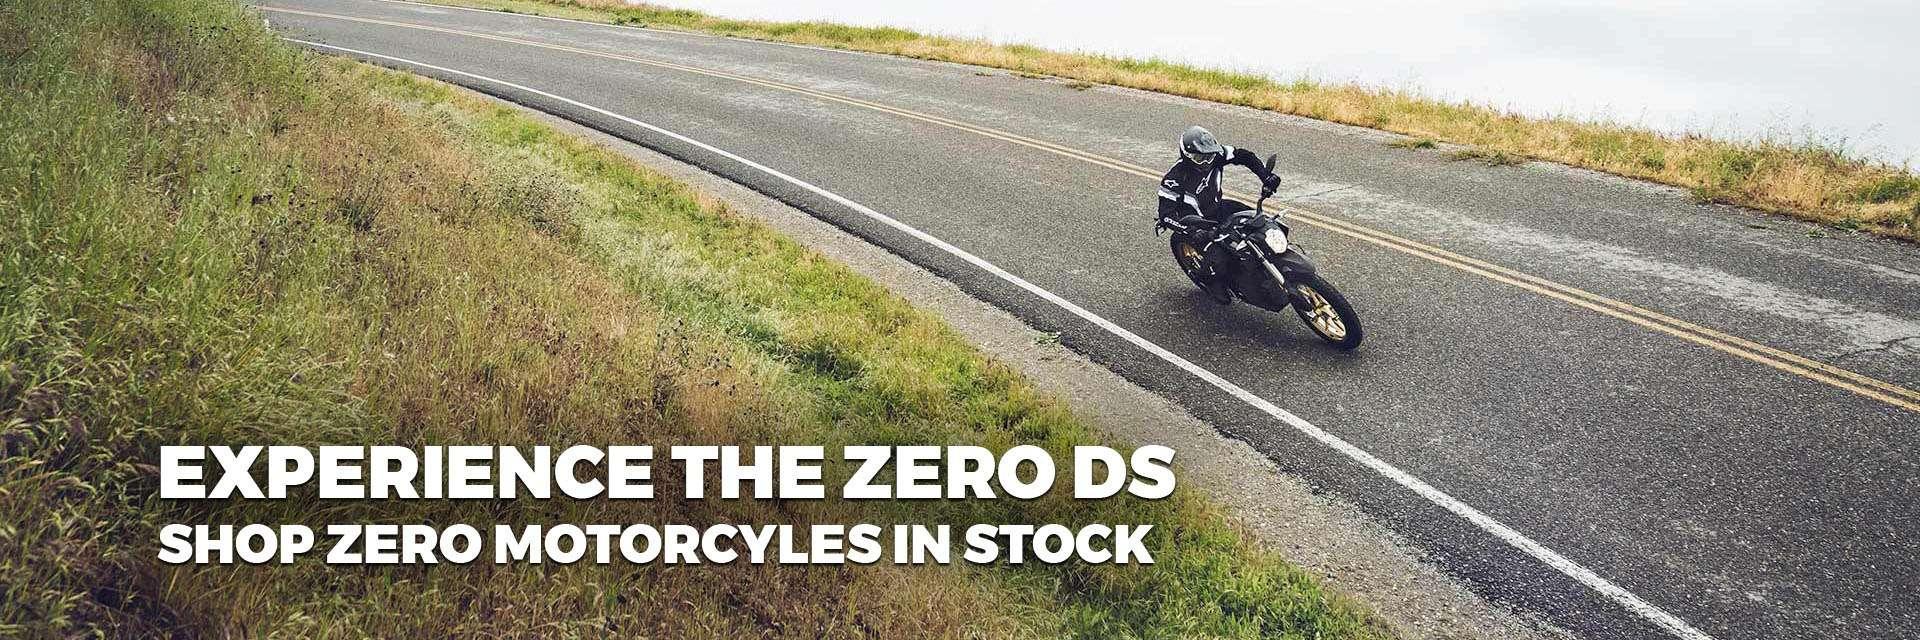 hap s cycle sales motorsports vehicles bmx bikes for sale